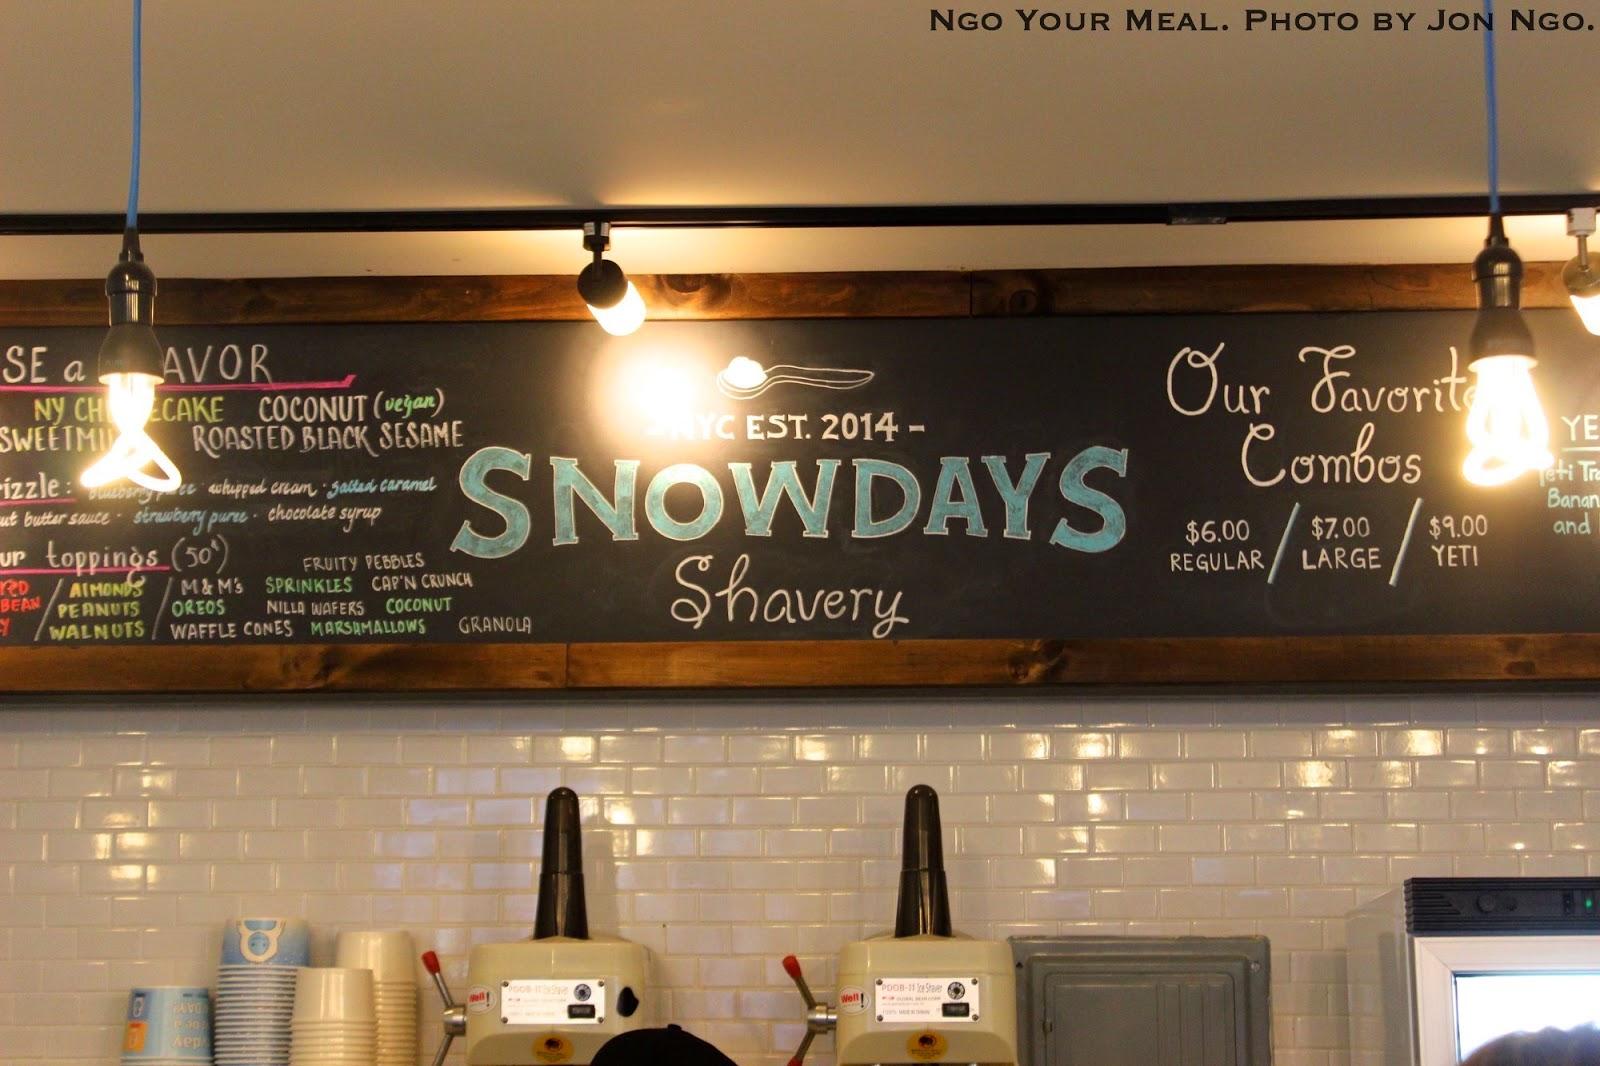 Snowdays Shavery